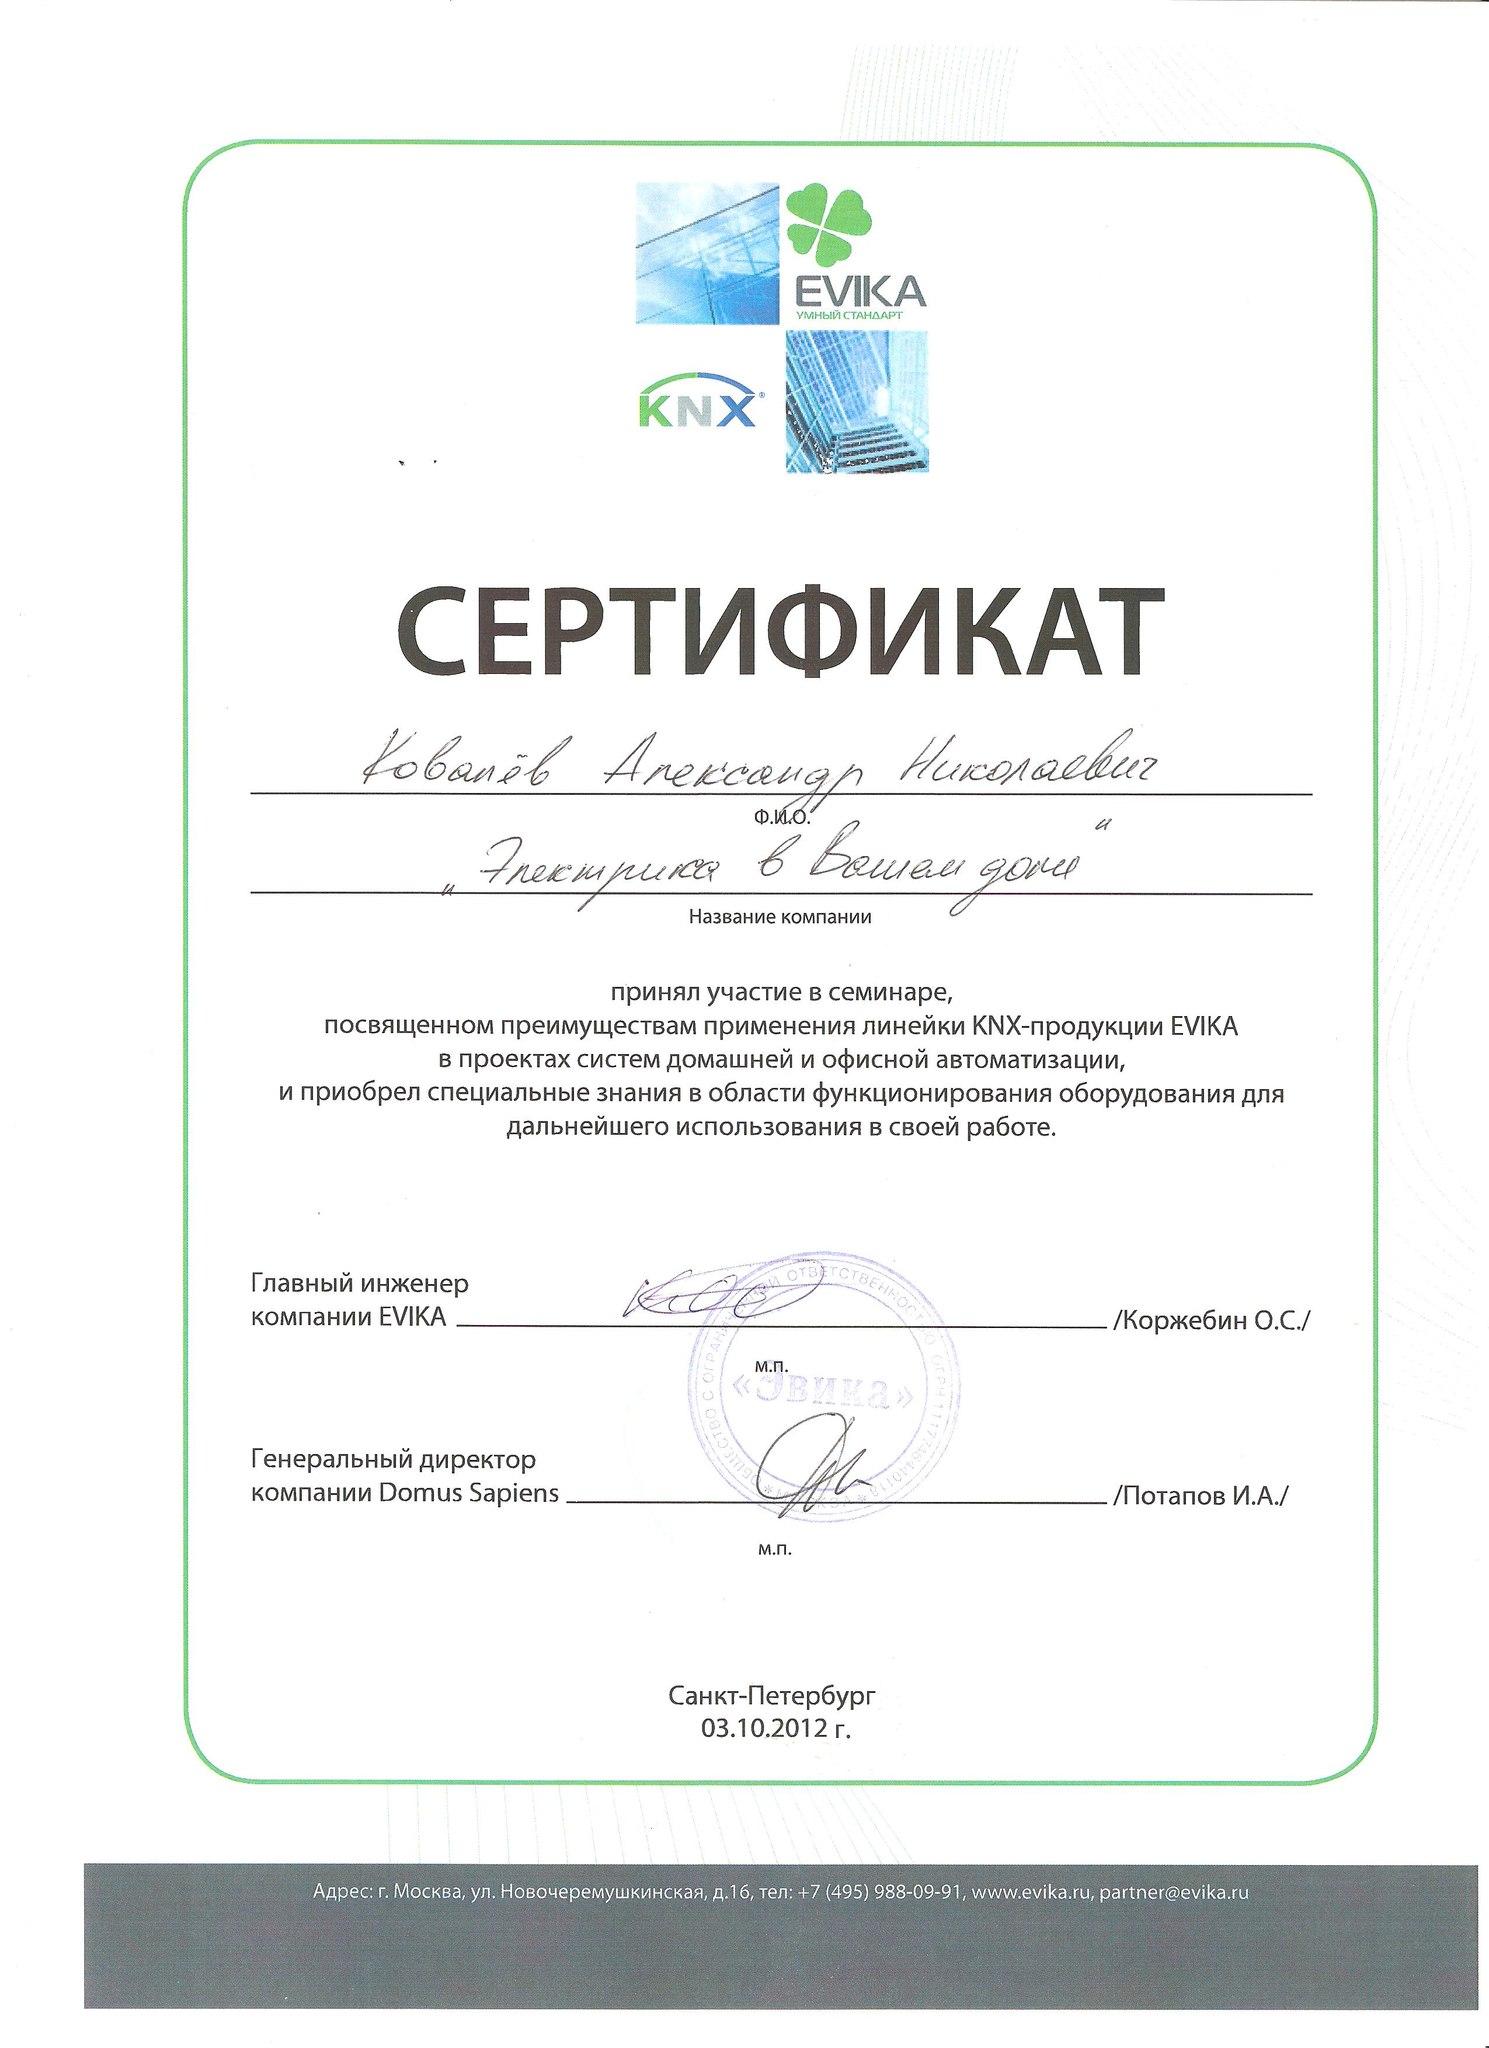 Домашняя и офисная автоматизация на платформе KNX от производителя Evika